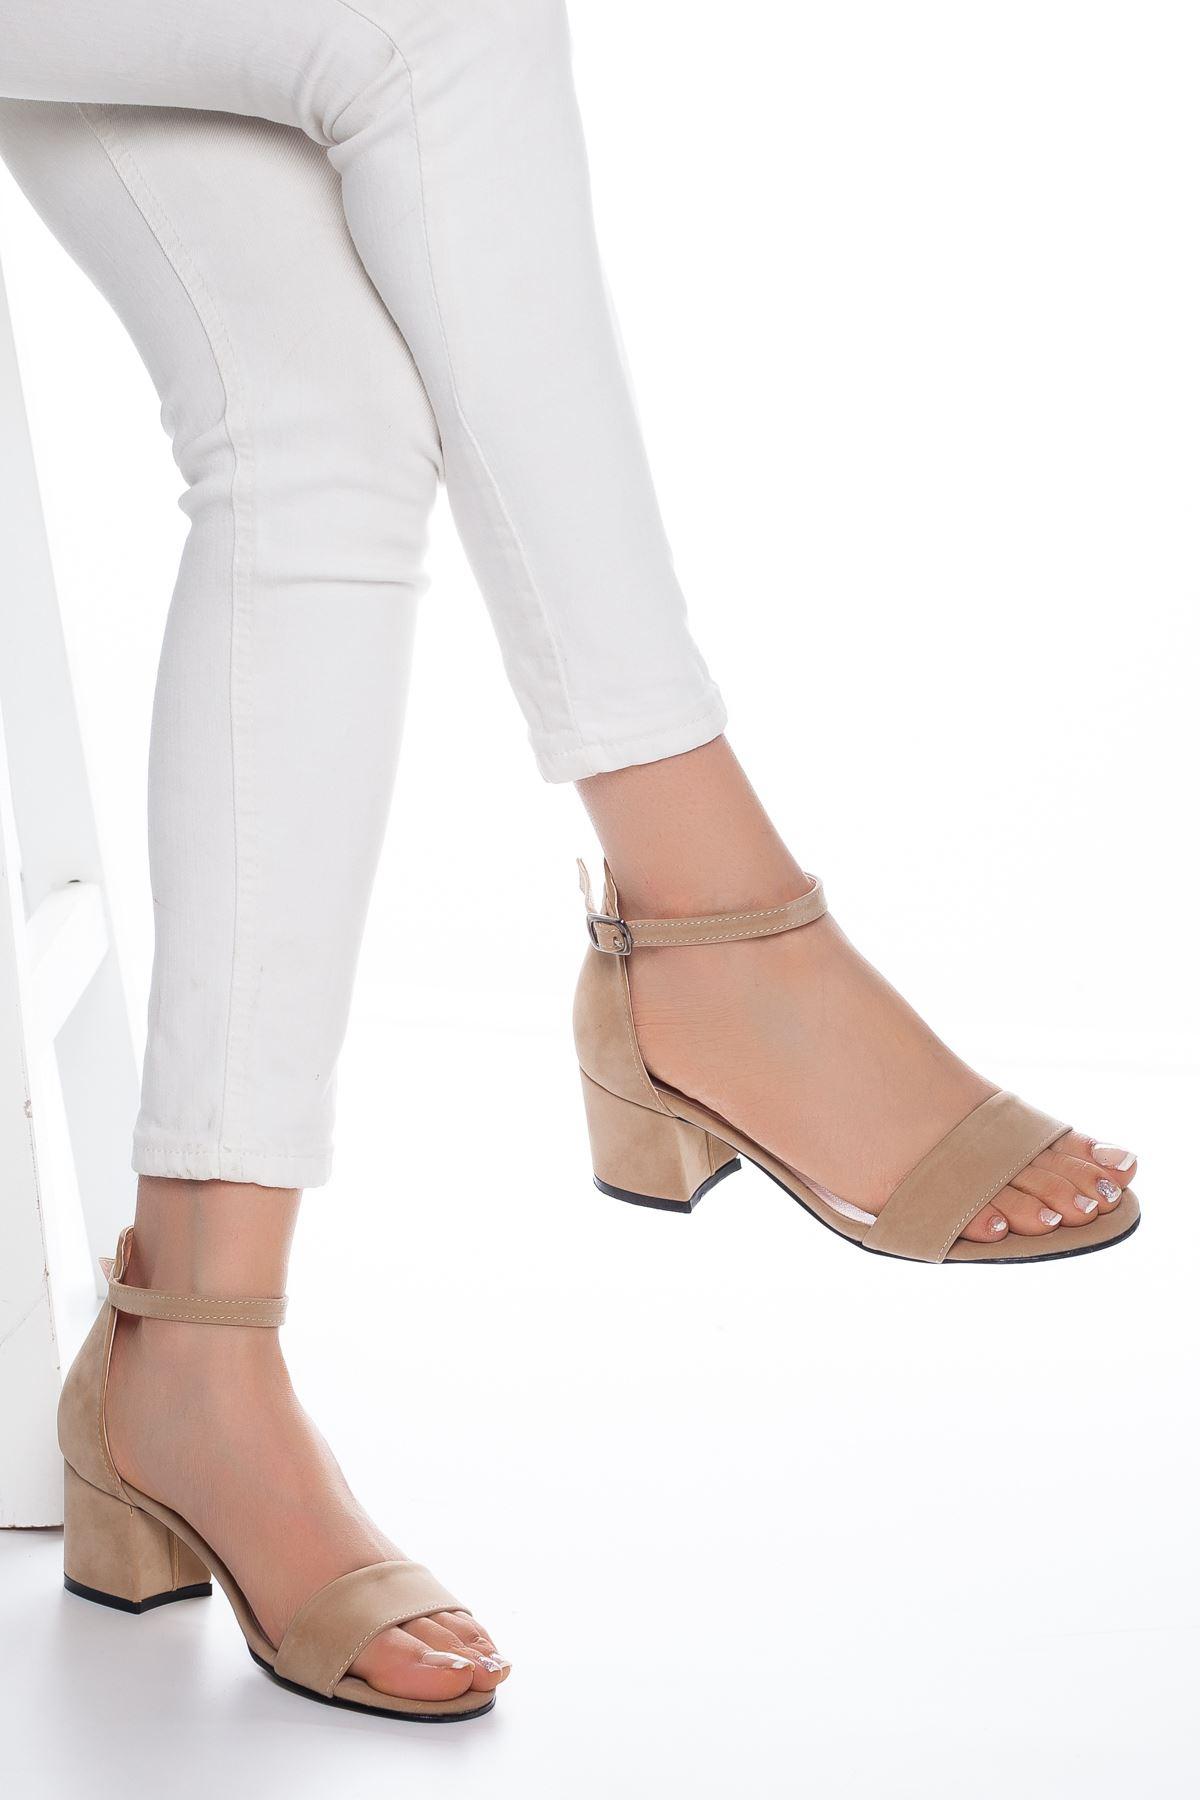 Lala Süet Topuklu Ayakkabı Ten